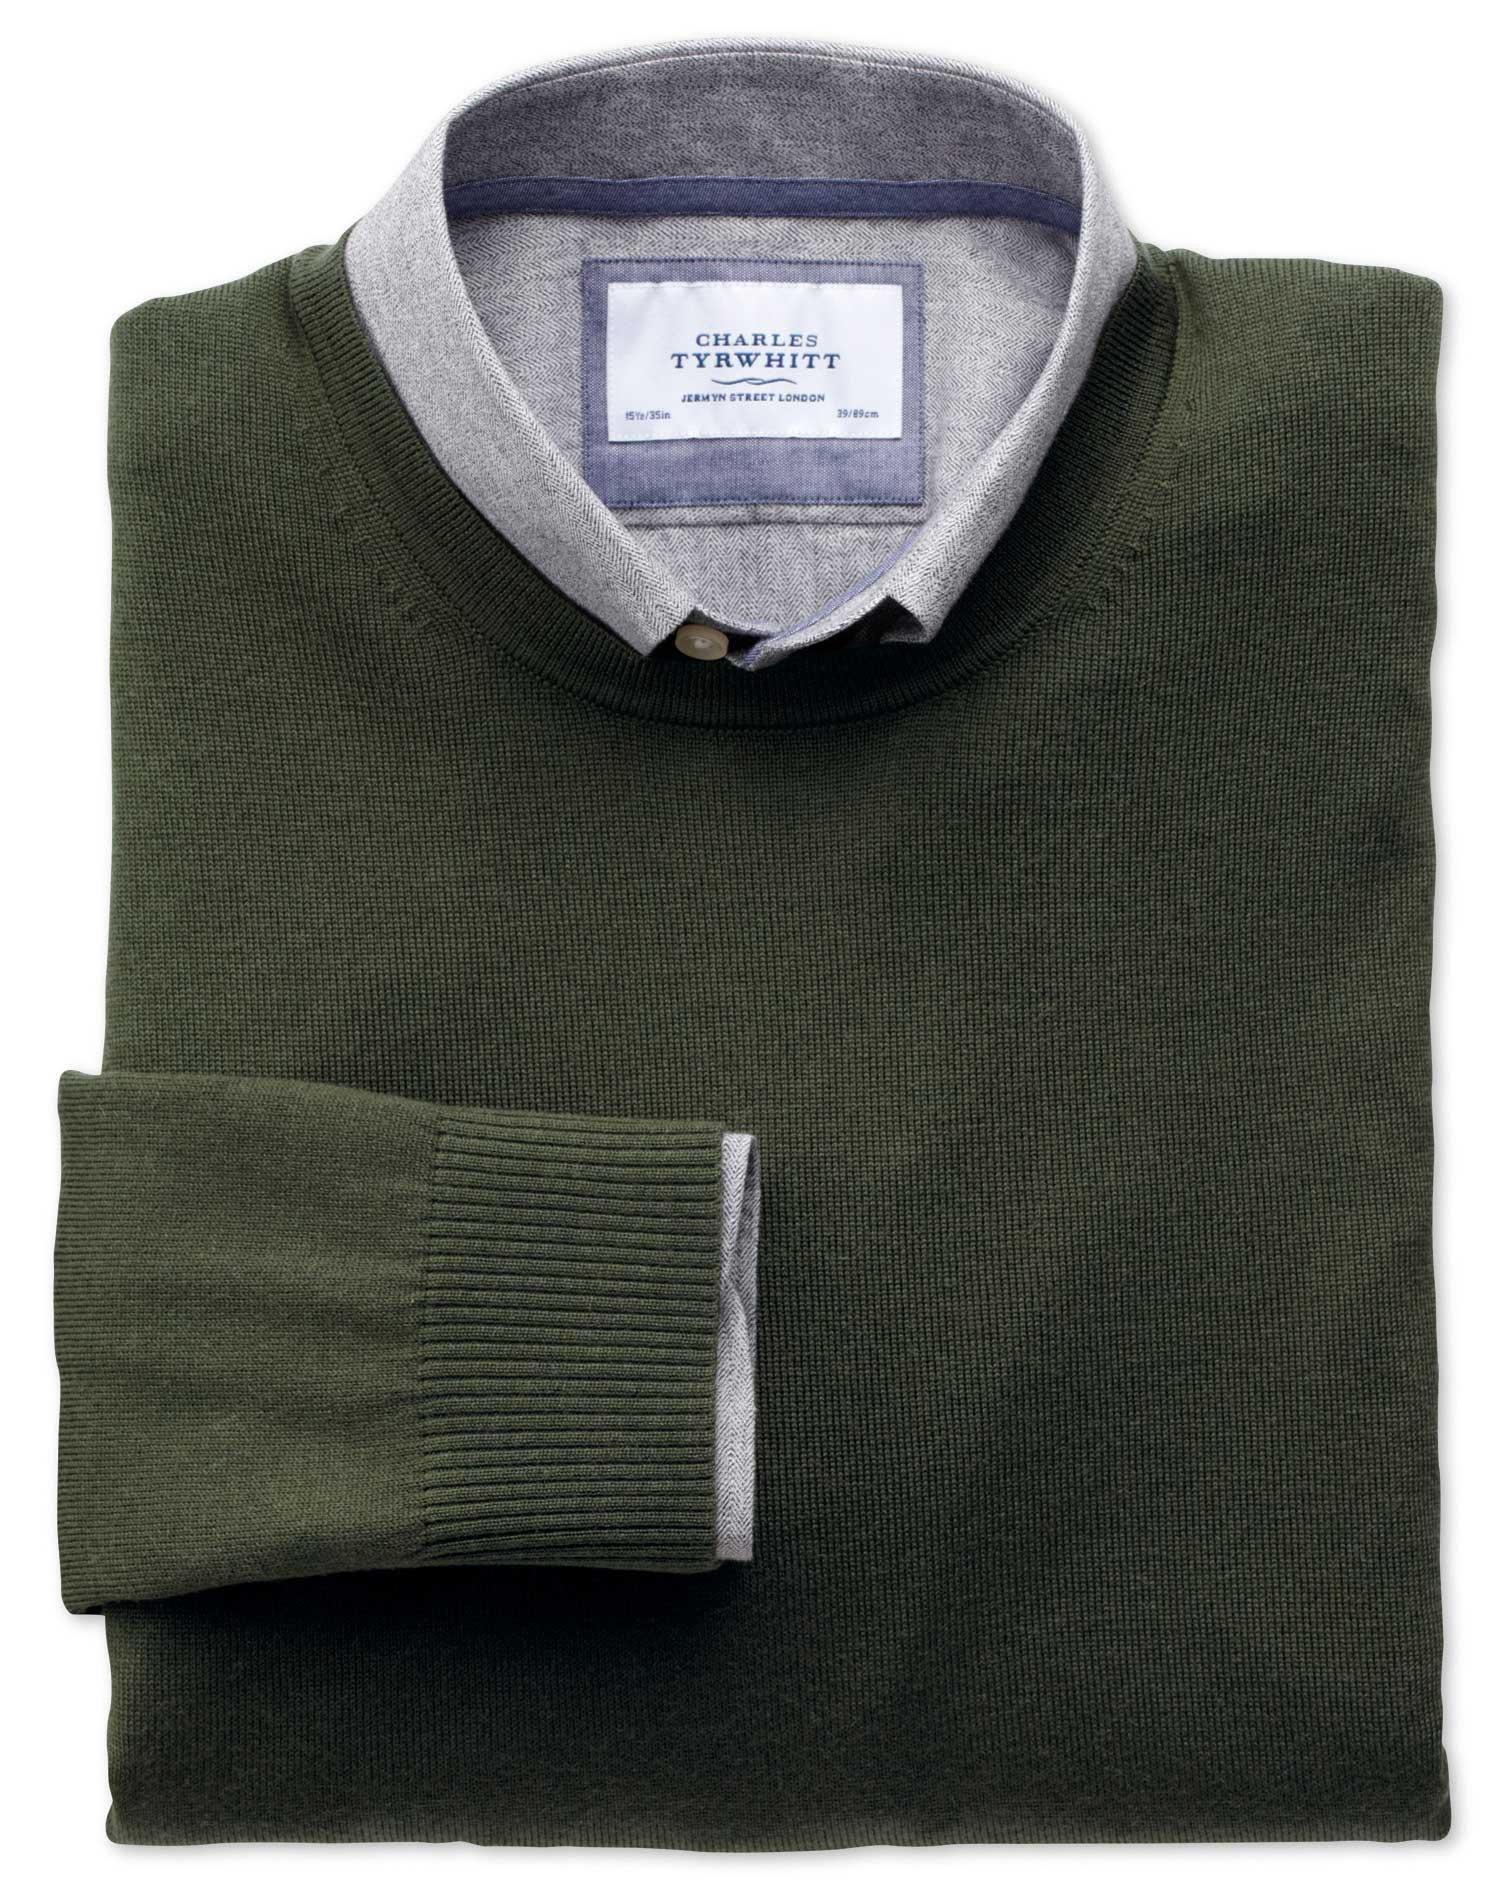 Dark Green Merino Wool Crew Neck Jumper Size XL by Charles Tyrwhitt